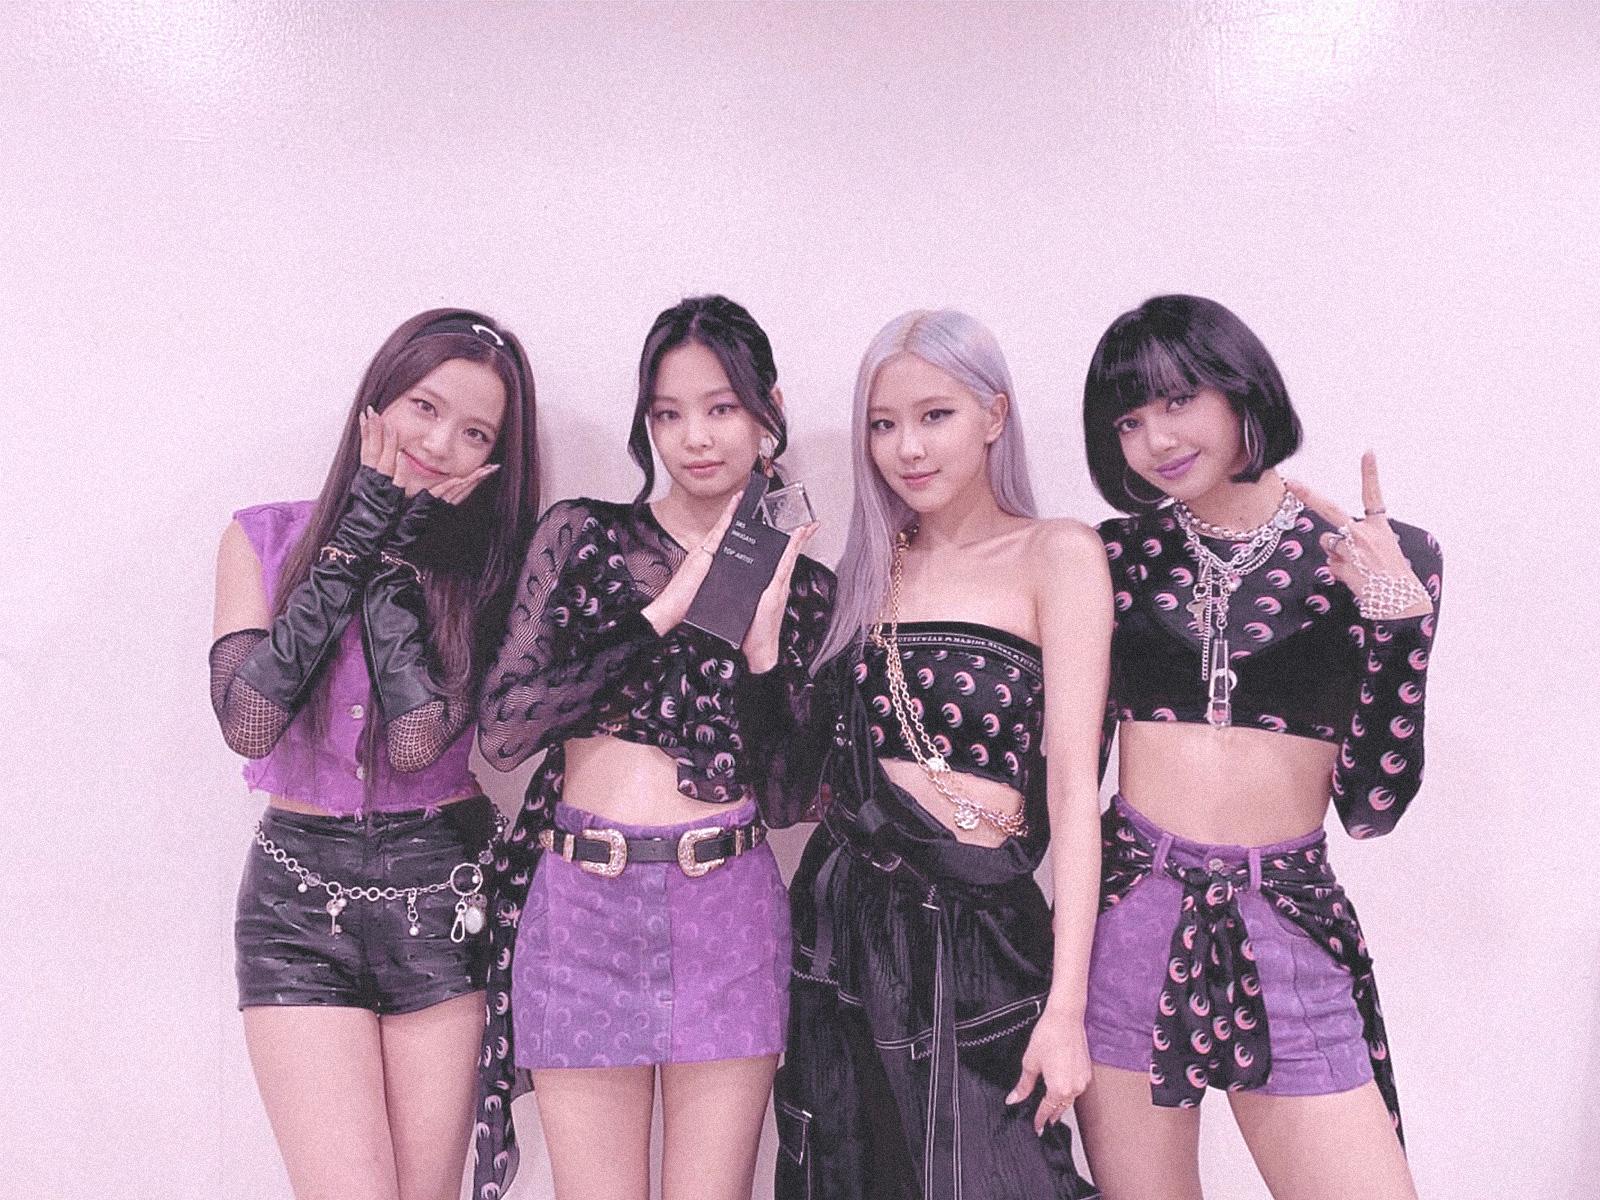 Dress Up Like BlackPink at Inkigayo